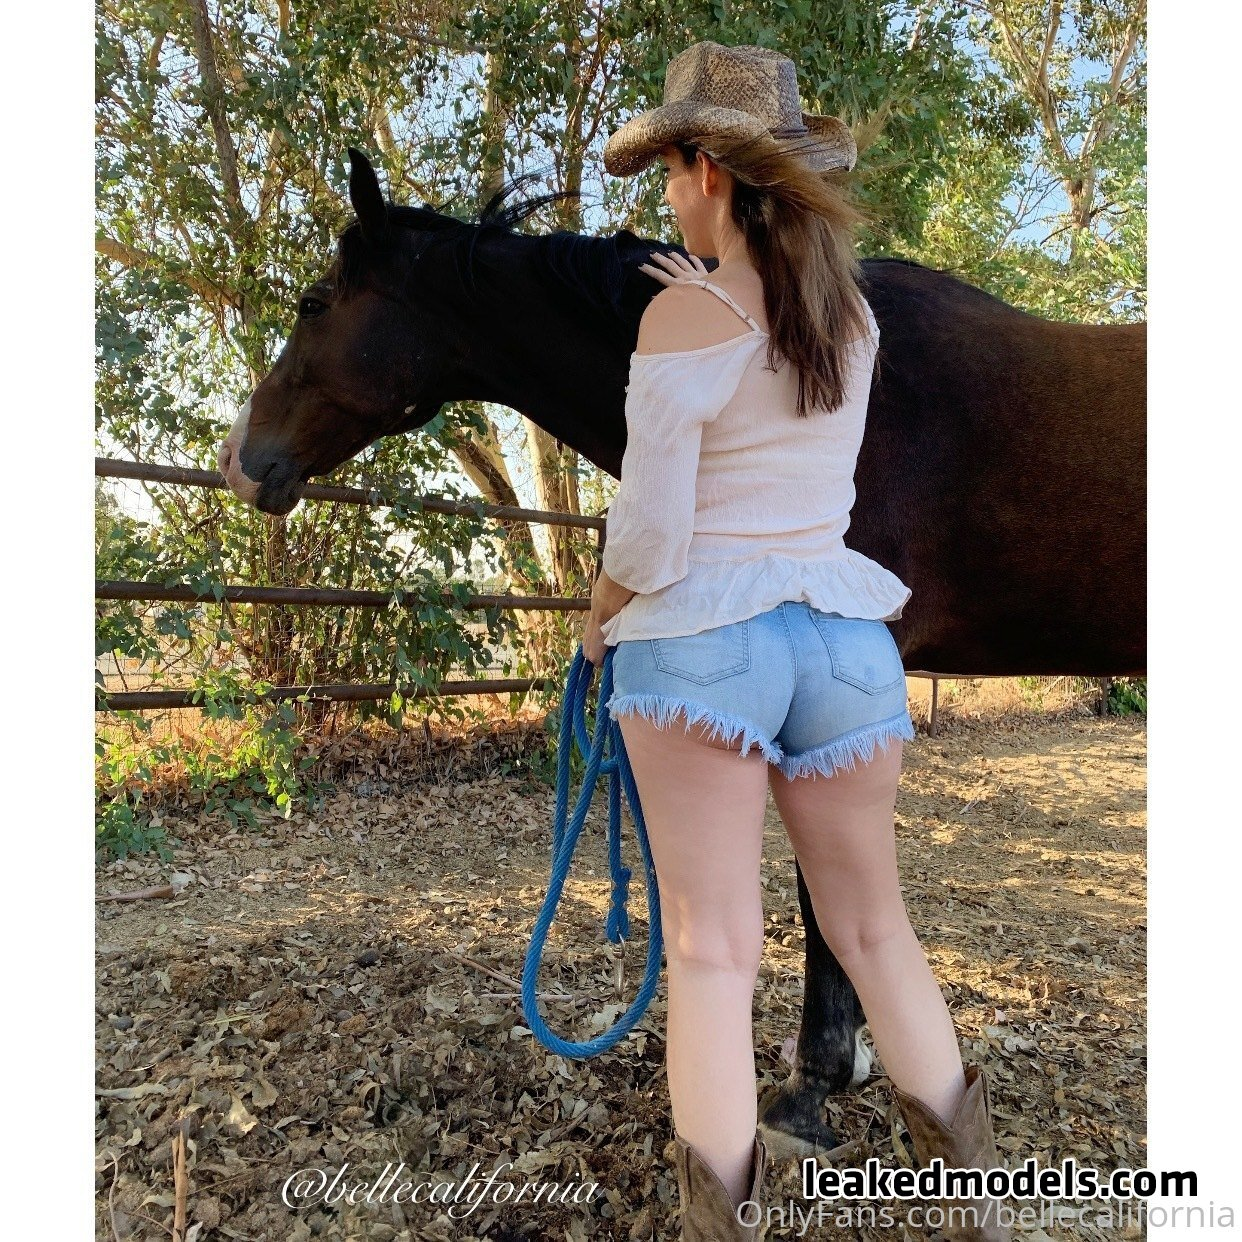 Belle California – bellecalifornia OnlyFans Nude Leaks (25 Photos)